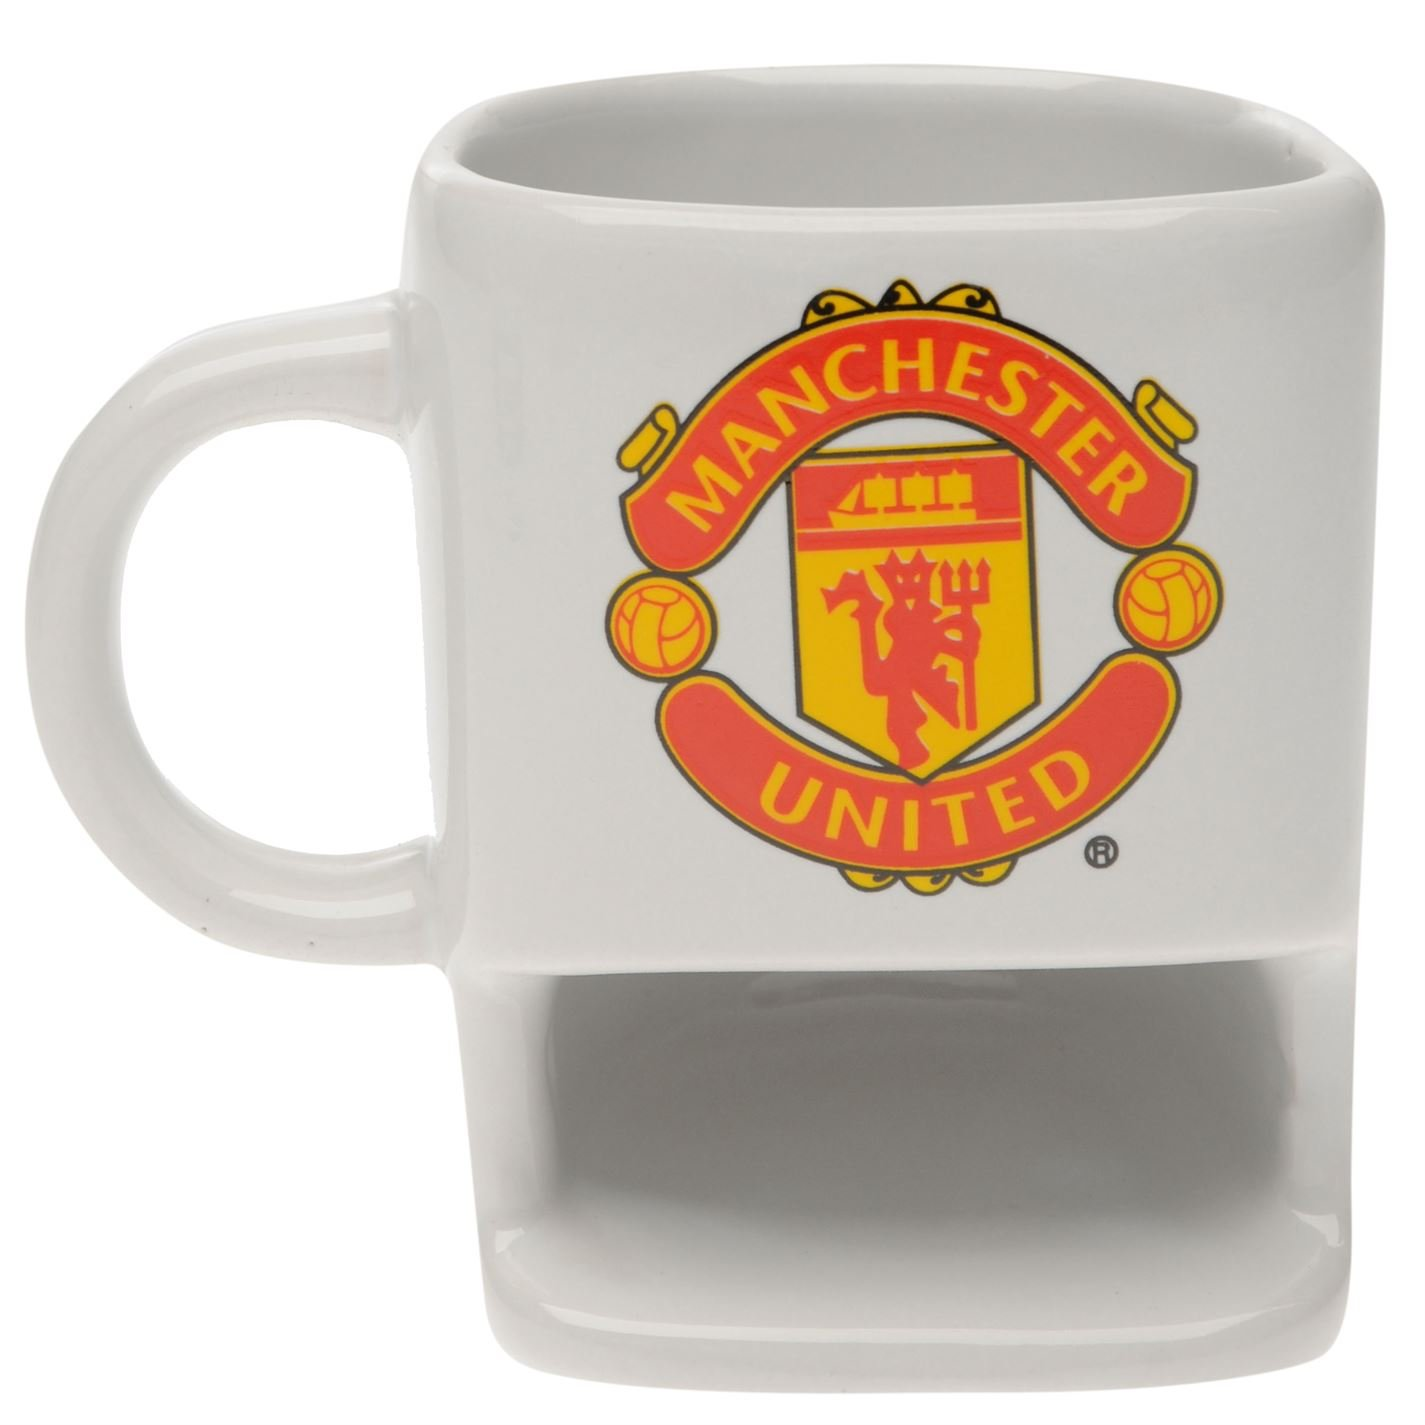 Club Crest Mug And Coaster Set Manchester United Football Club